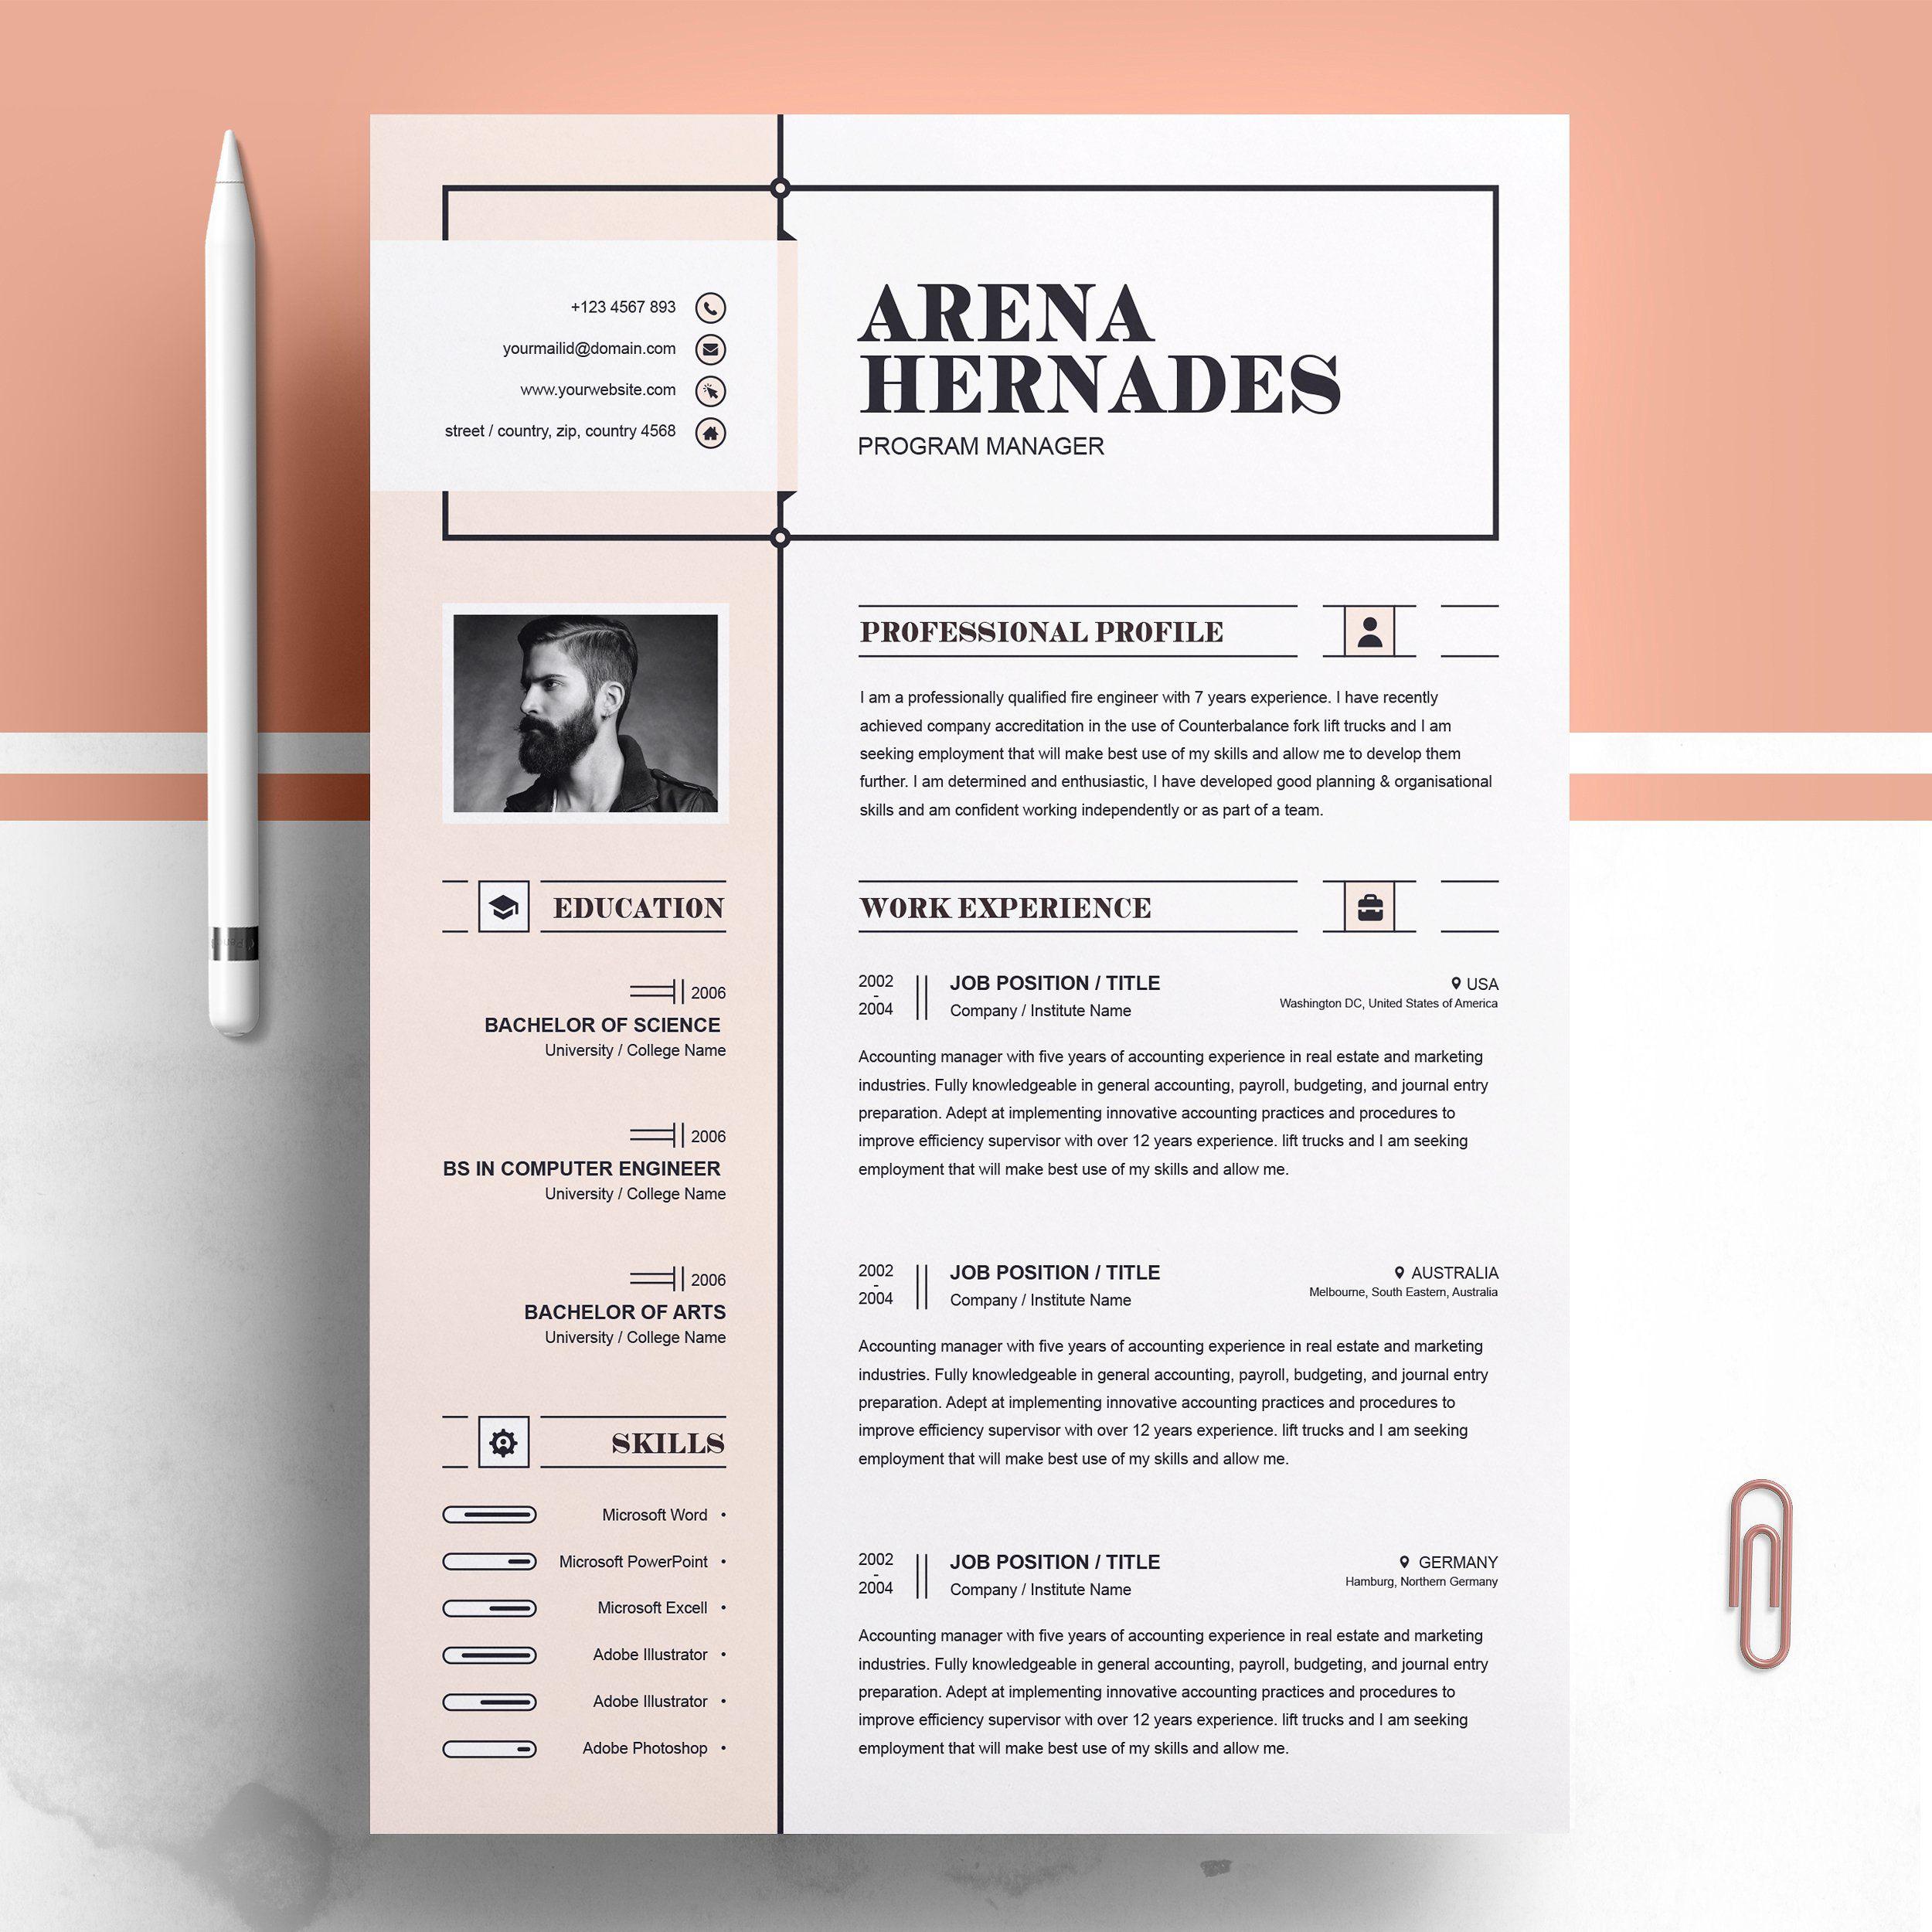 real estate modern resume designs - Seckin.ayodhya.co